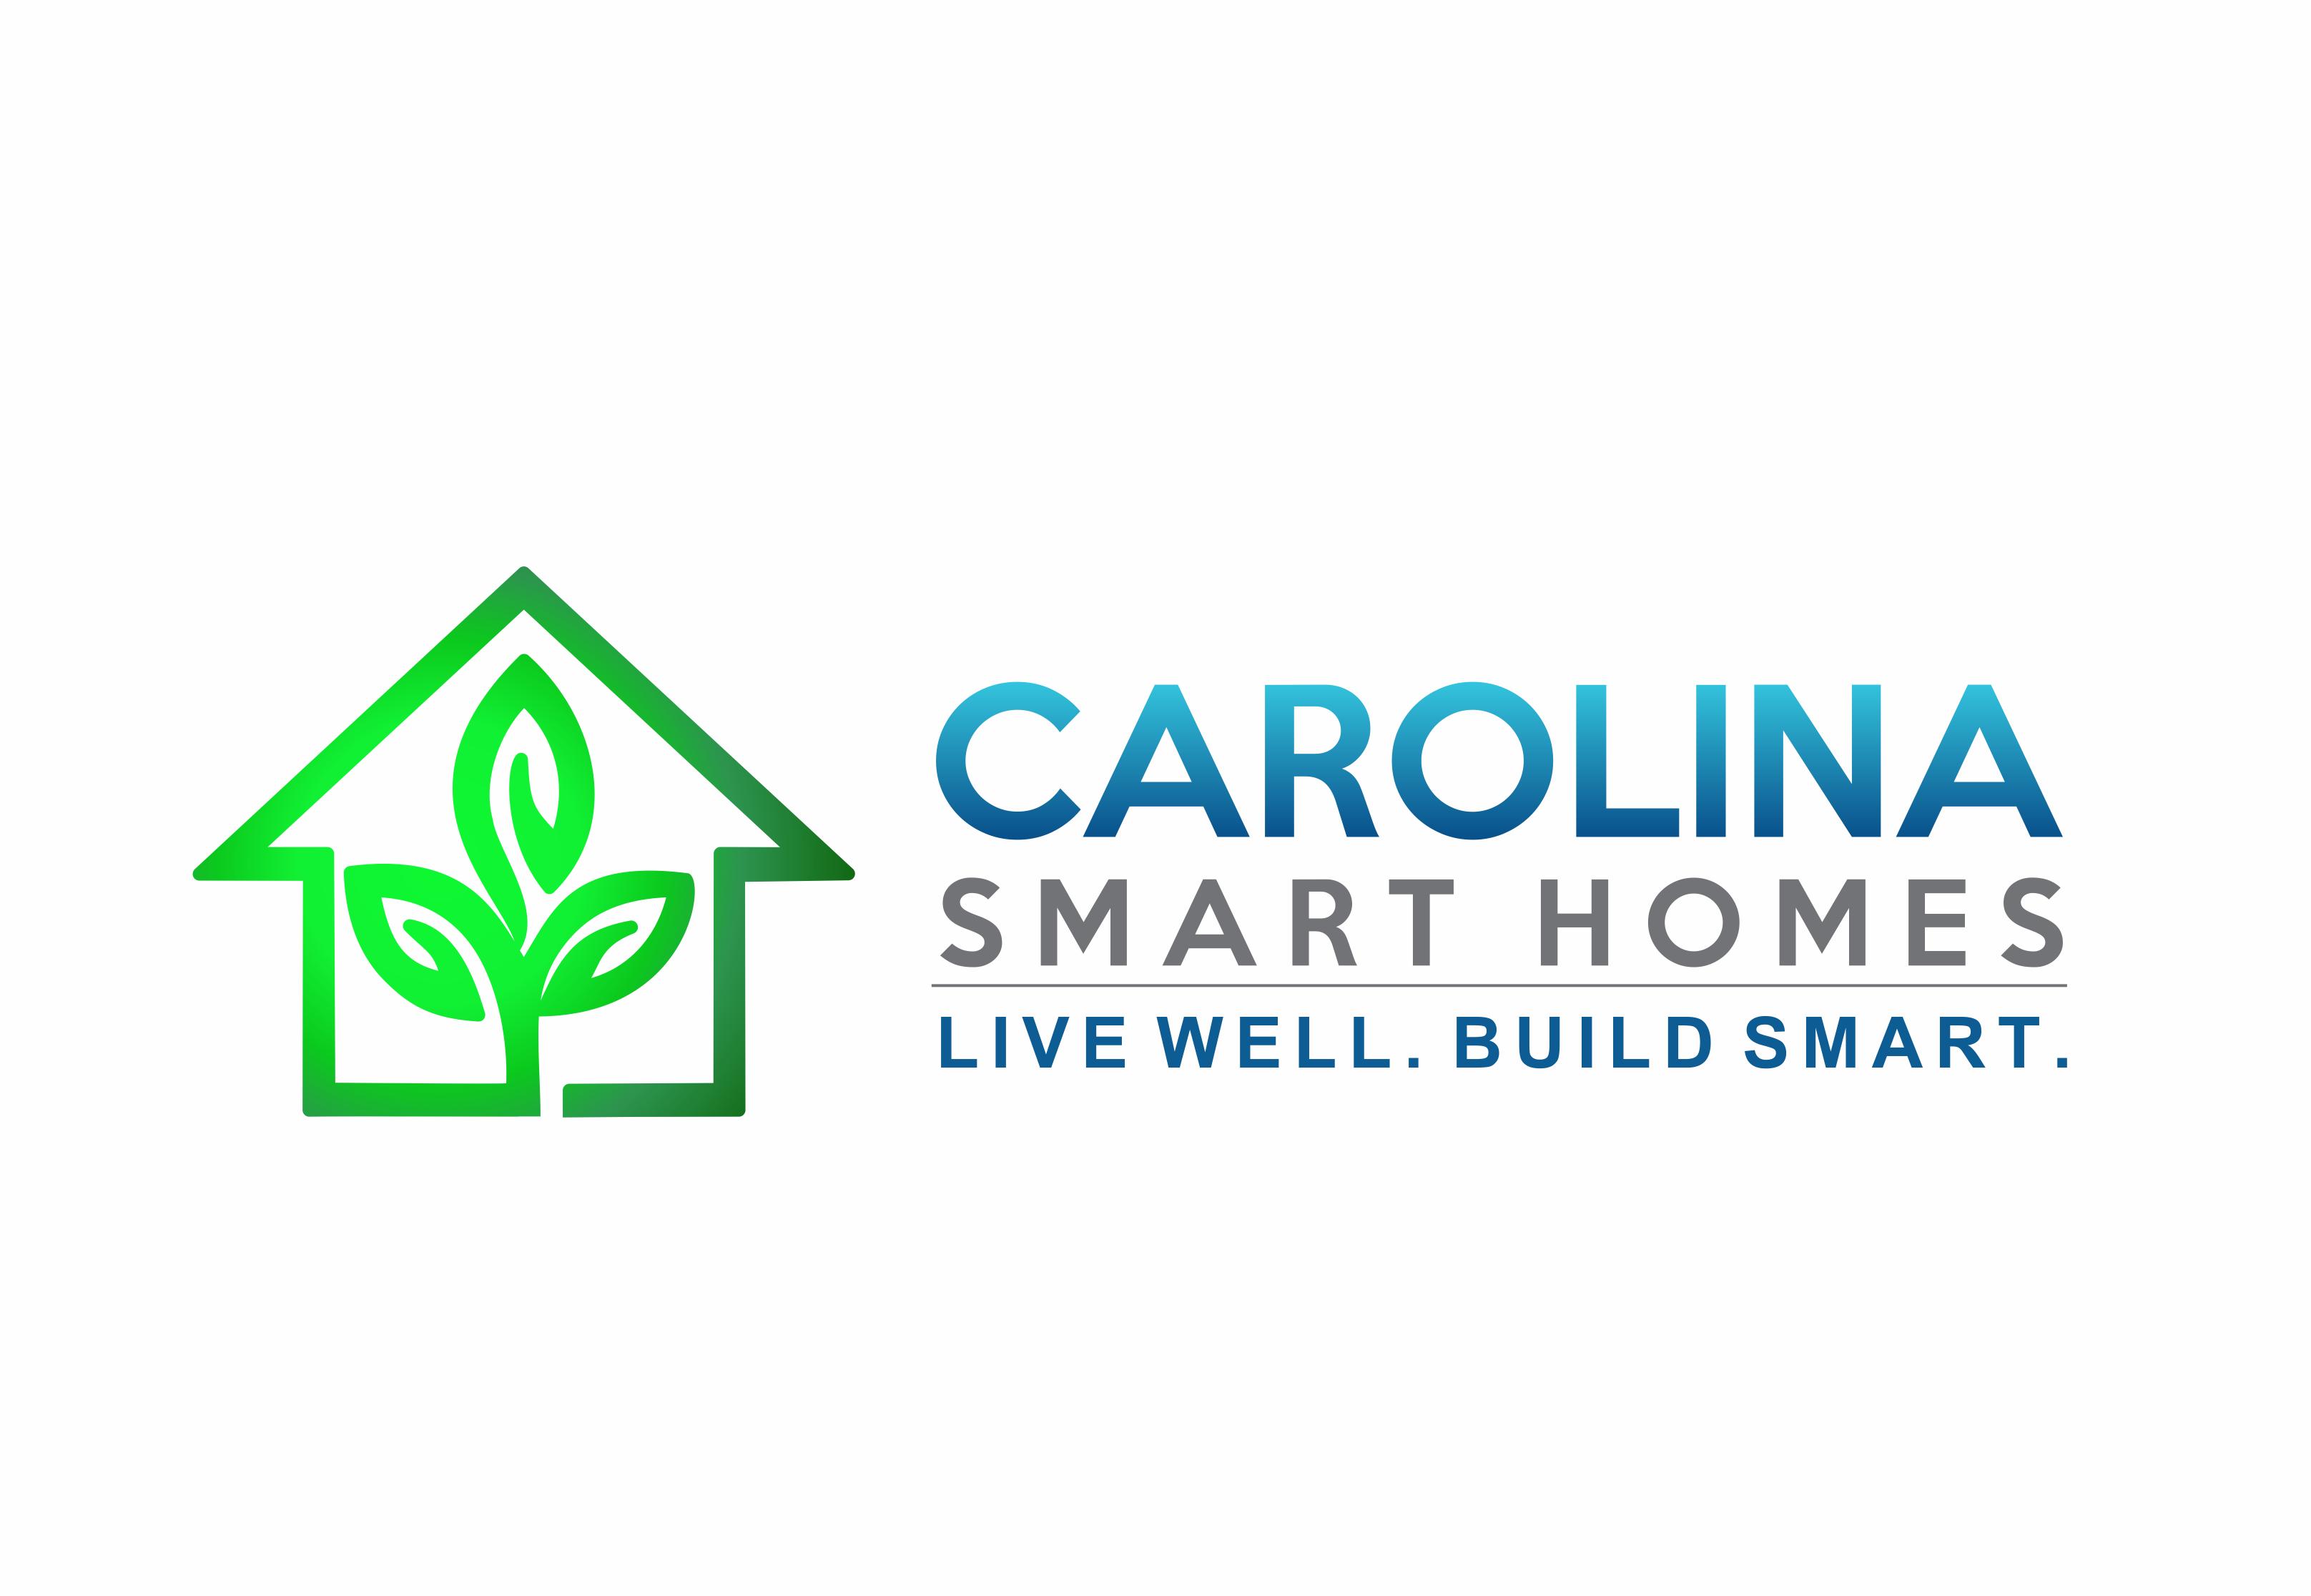 Carolina Smart Homes